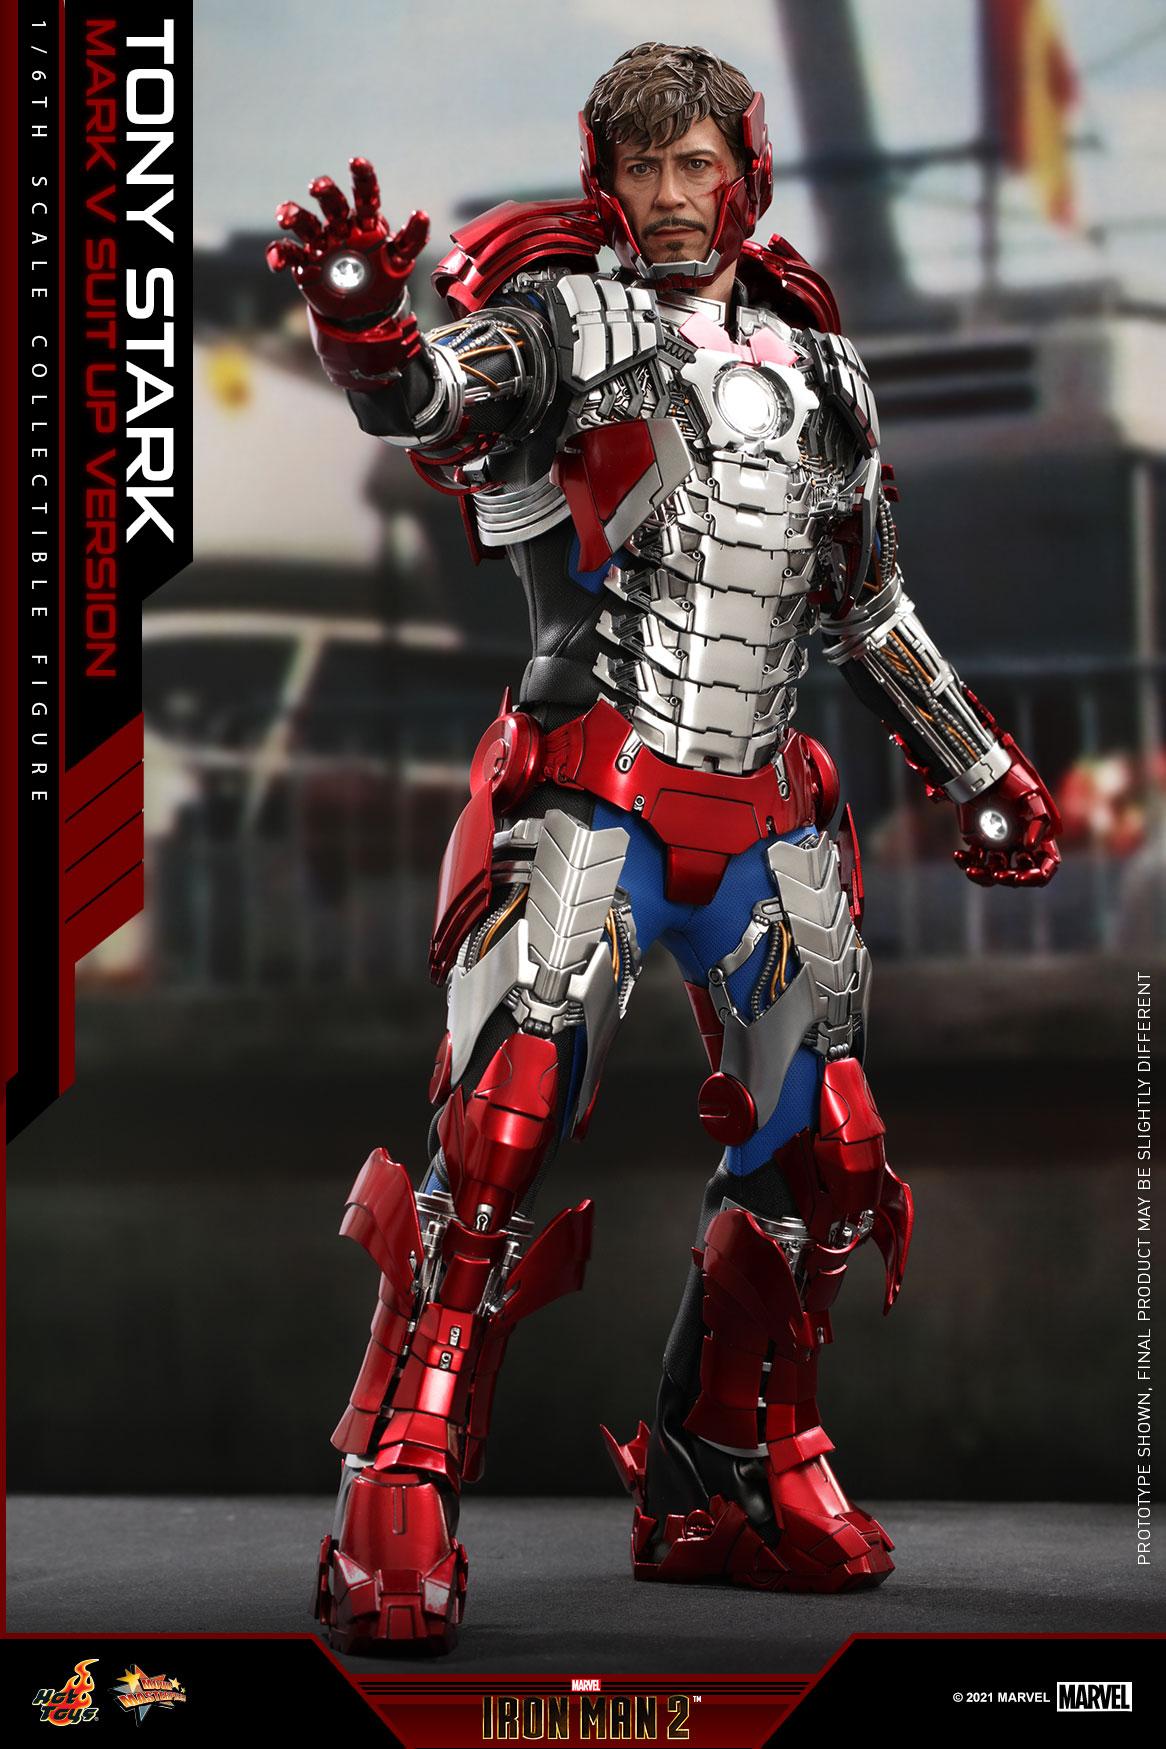 Hot Toys - IM2 - Tony Stark (Mark V Suit Up Version) collectible figure_PR5